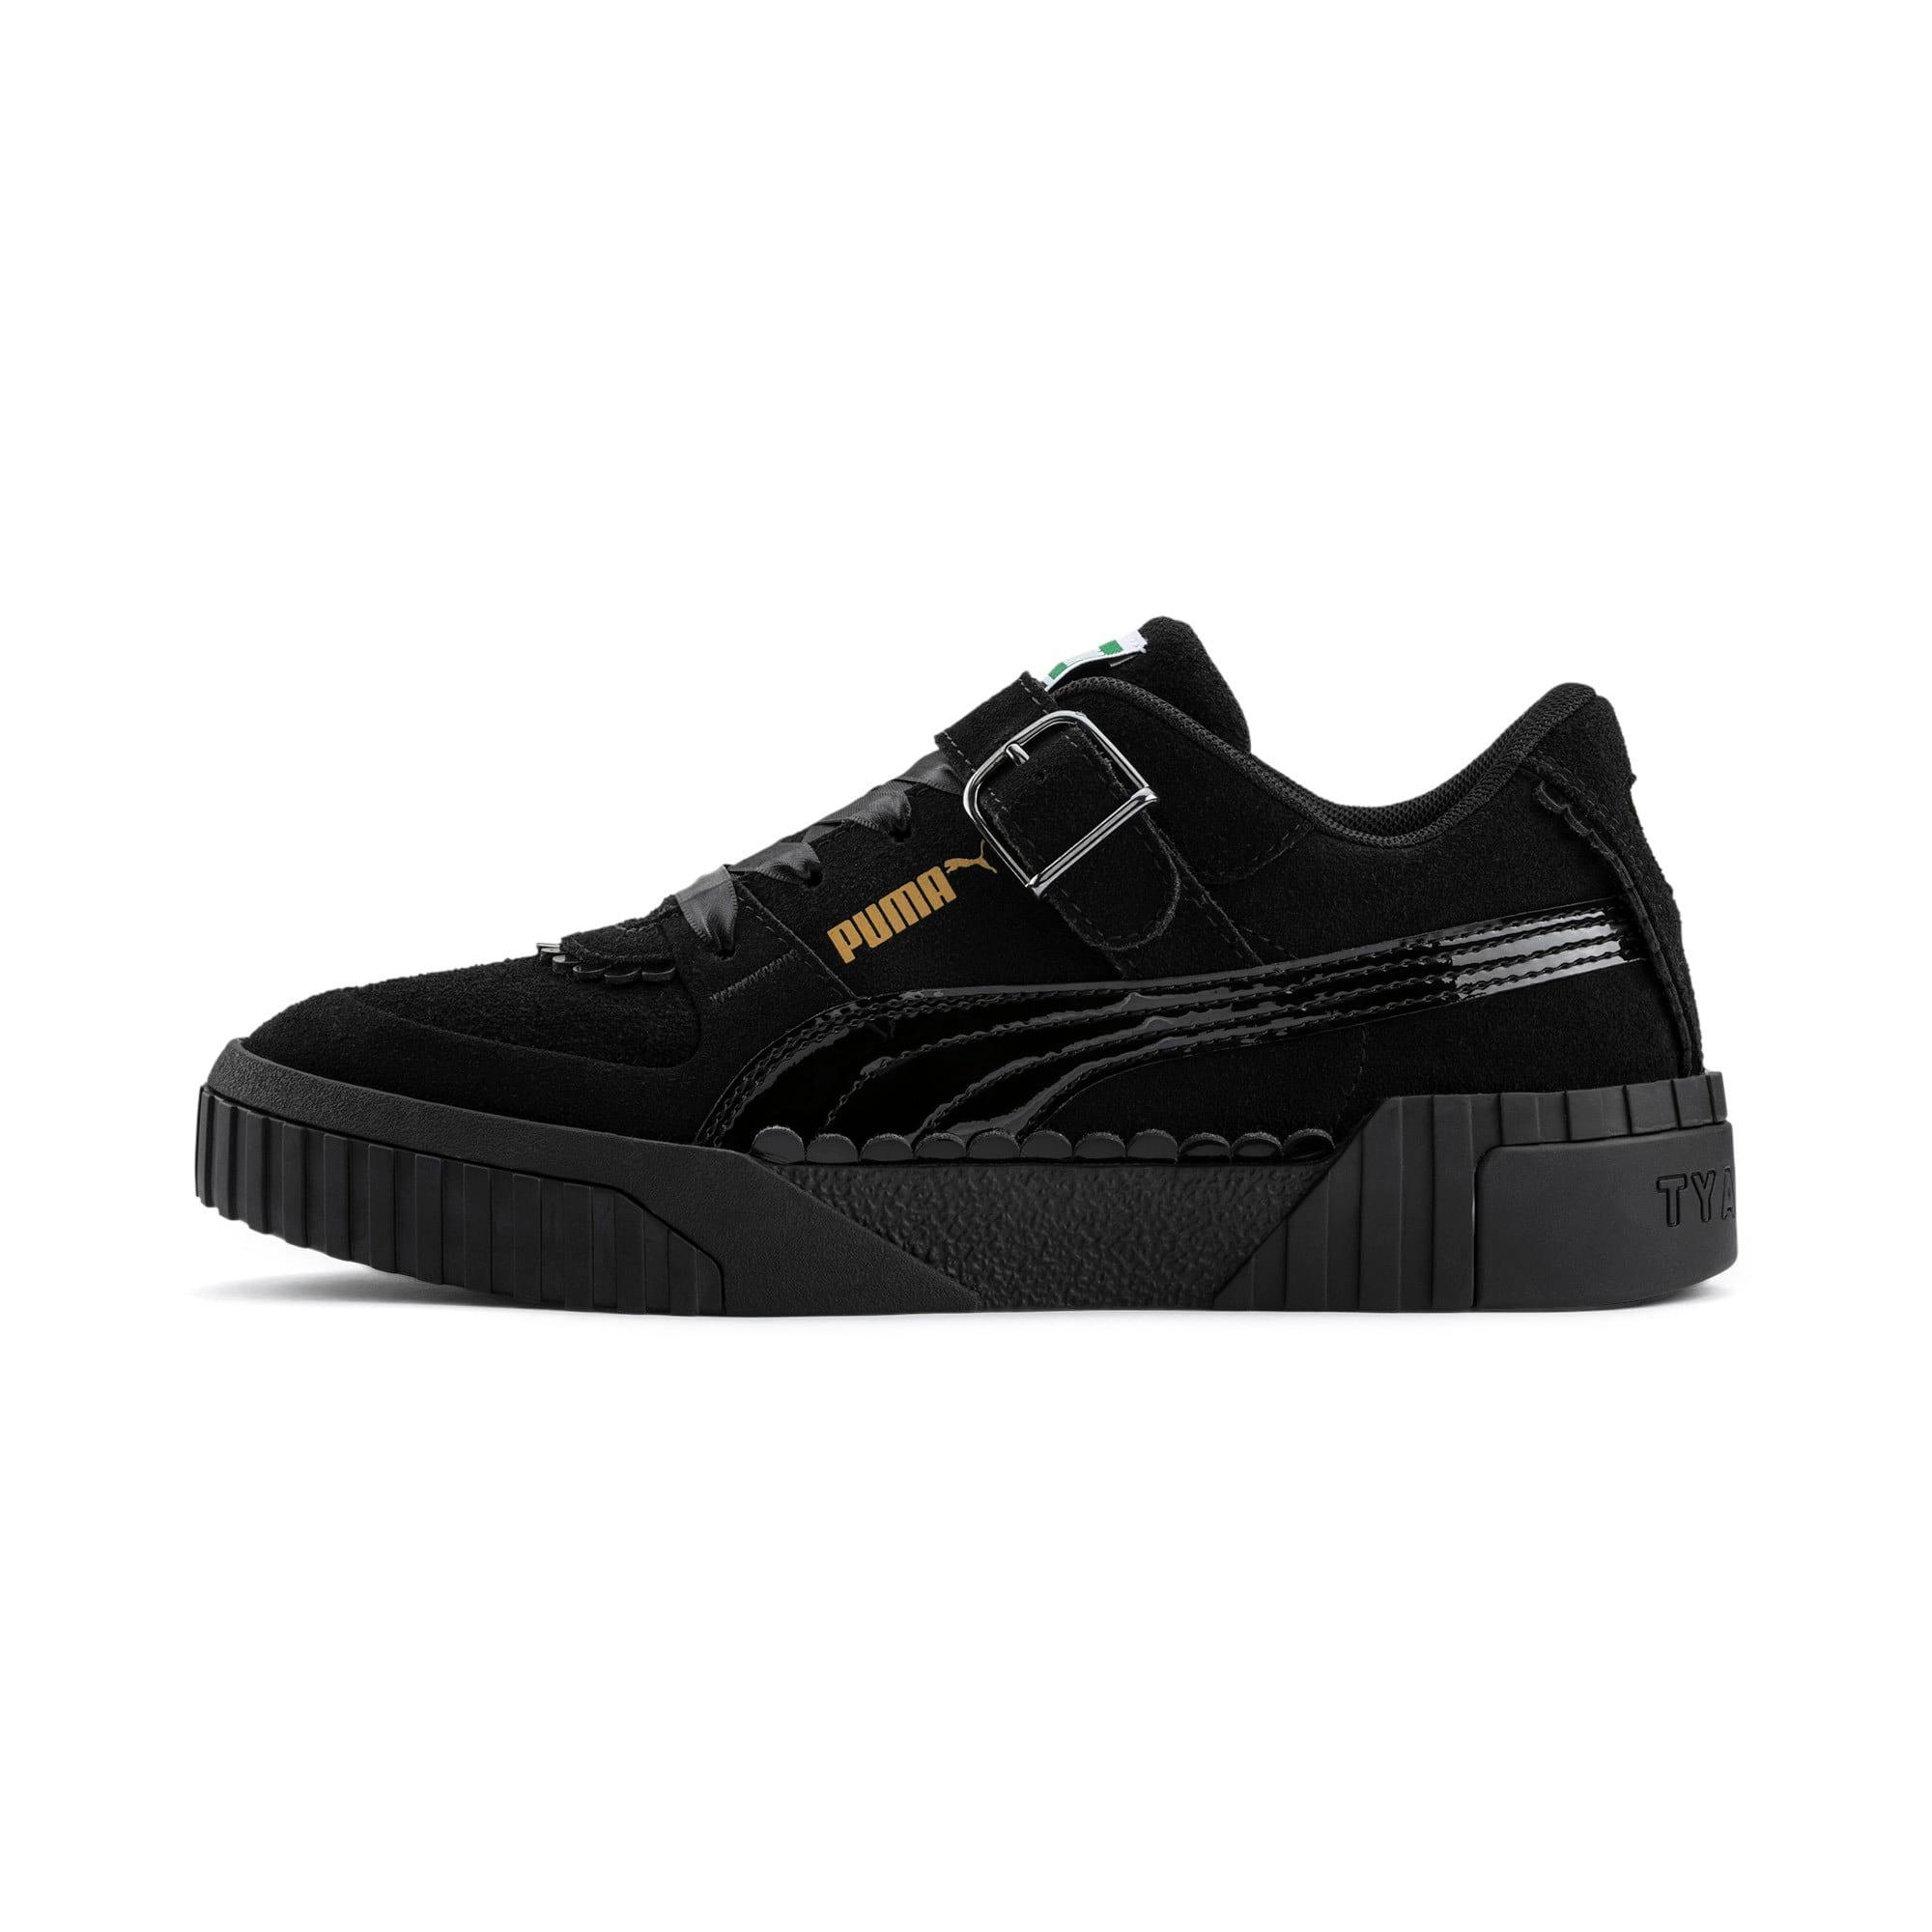 Thumbnail 1 of PUMA x TYAKASHA Cali Women's Sneakers, Puma Black, medium